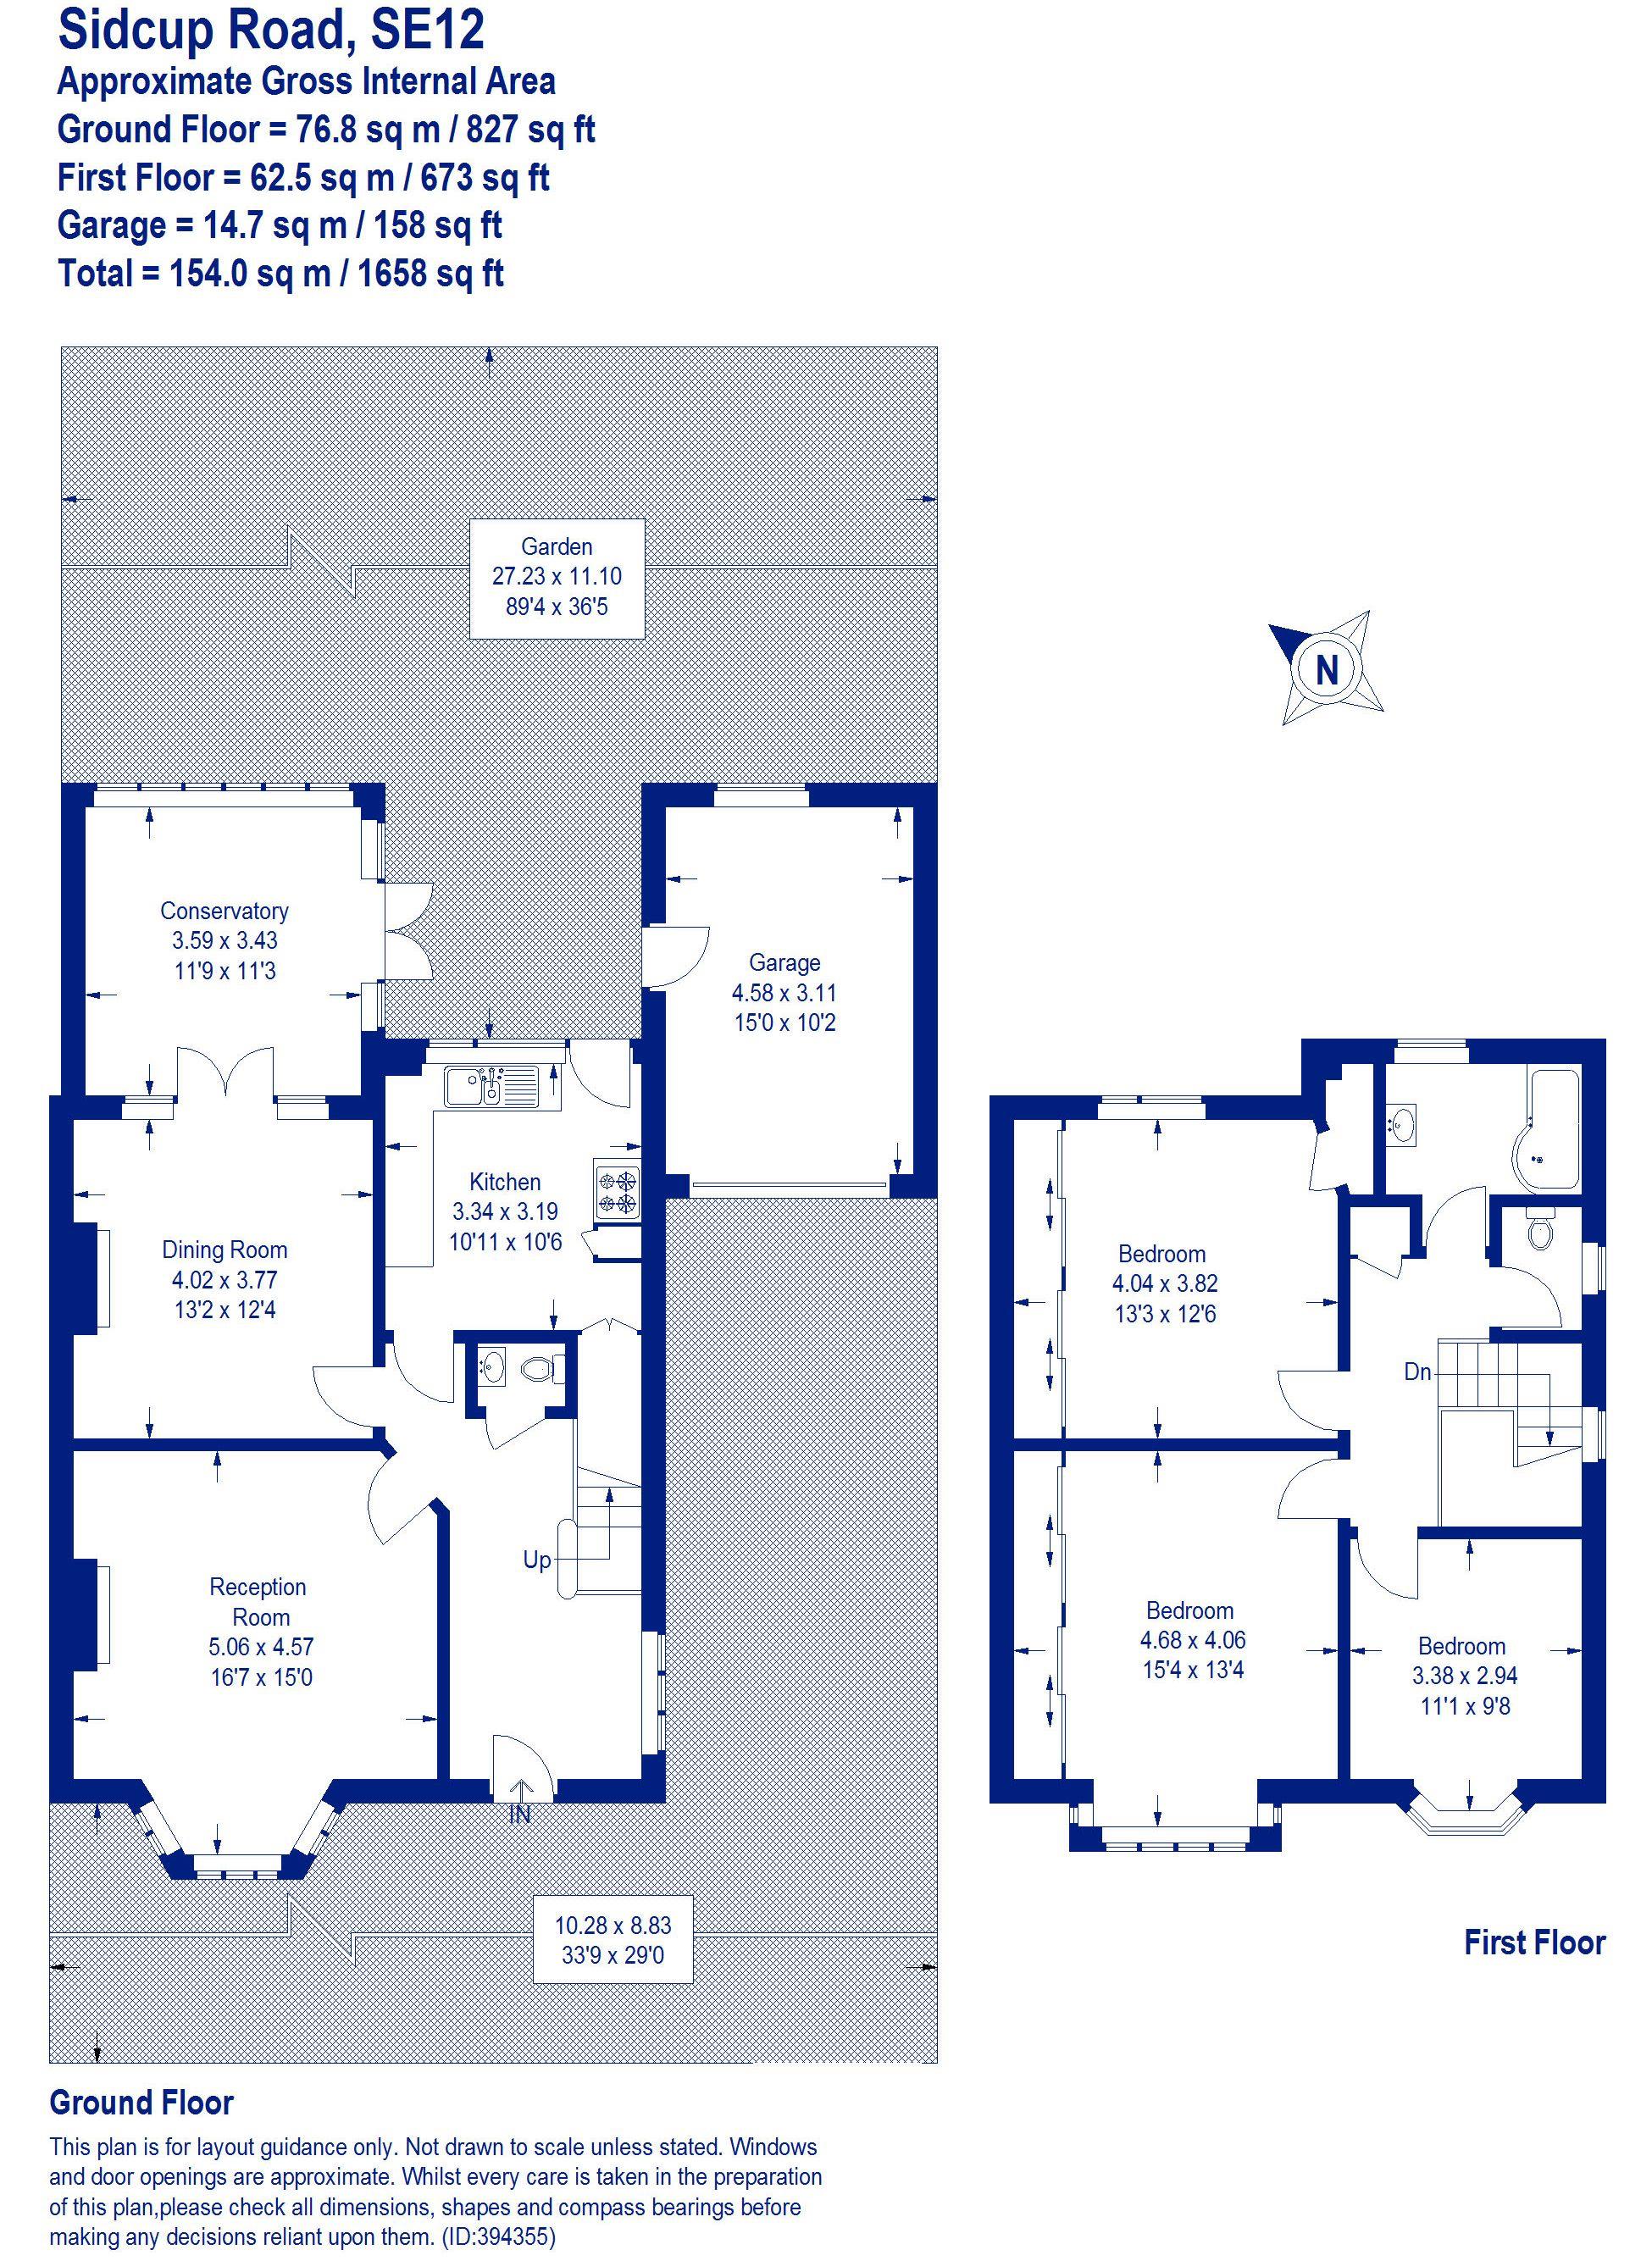 Property For Sale Sidcup Road Se